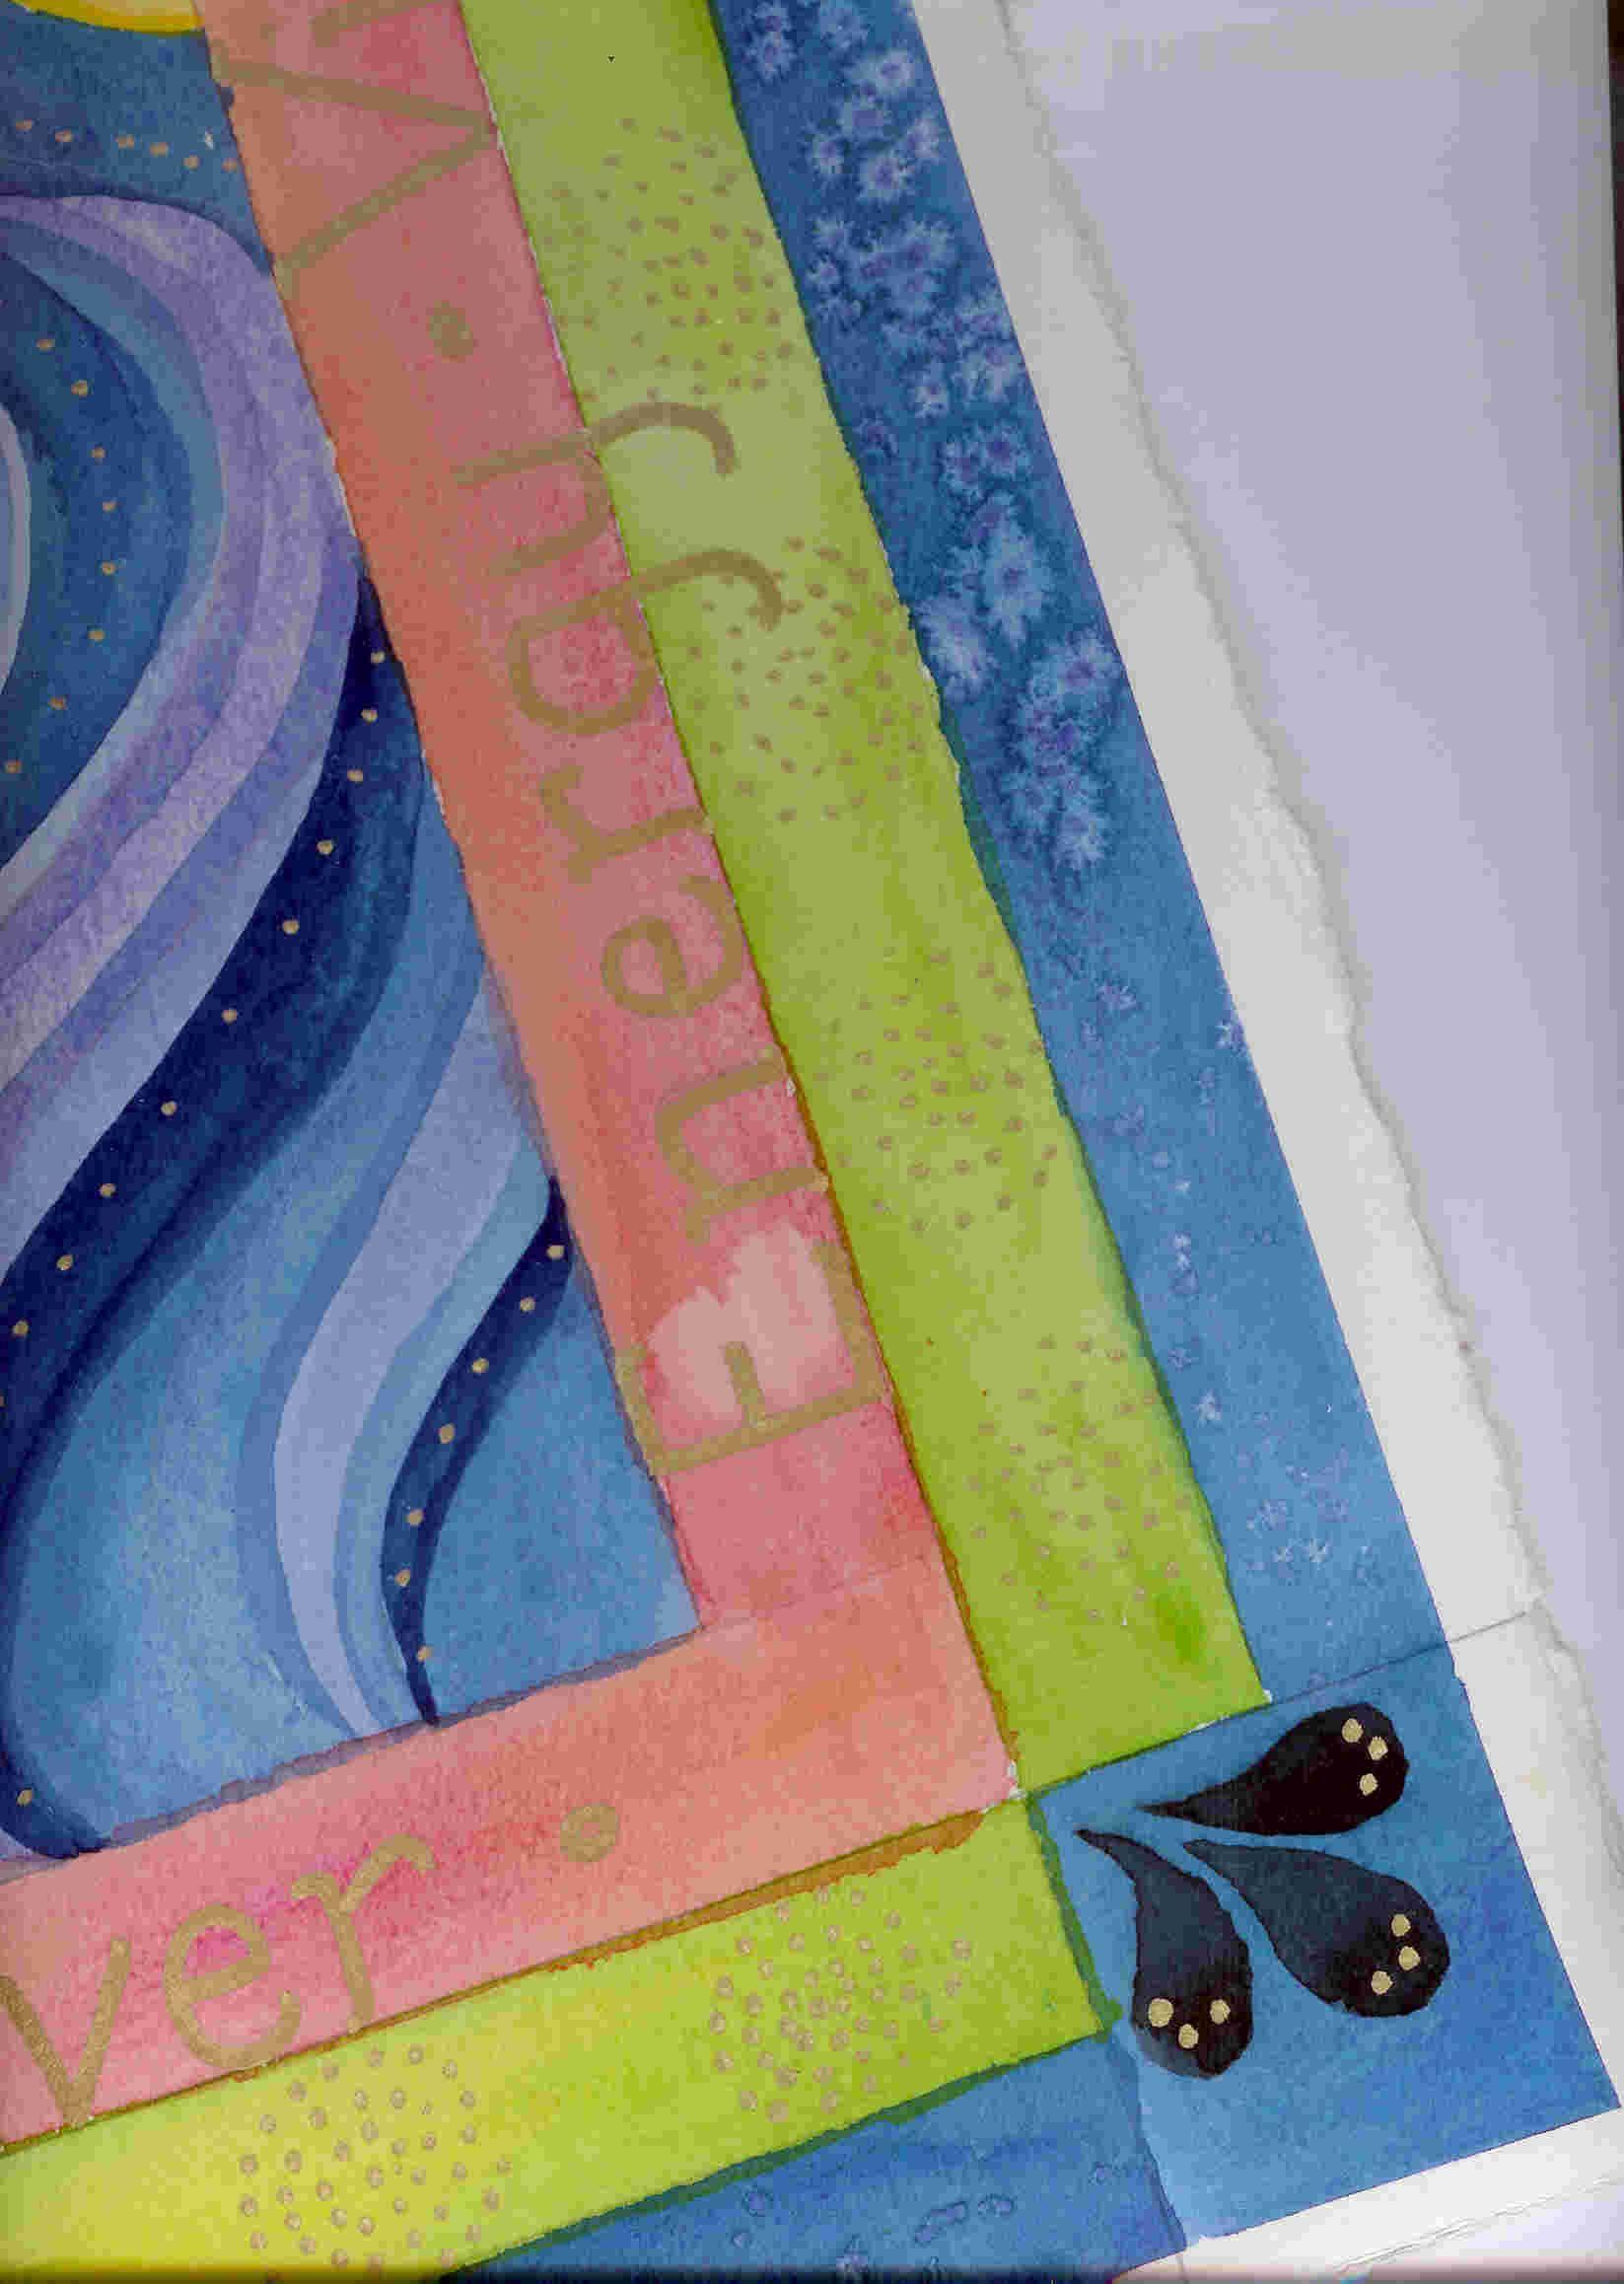 Bit of watercolor by Cathy Pfeil